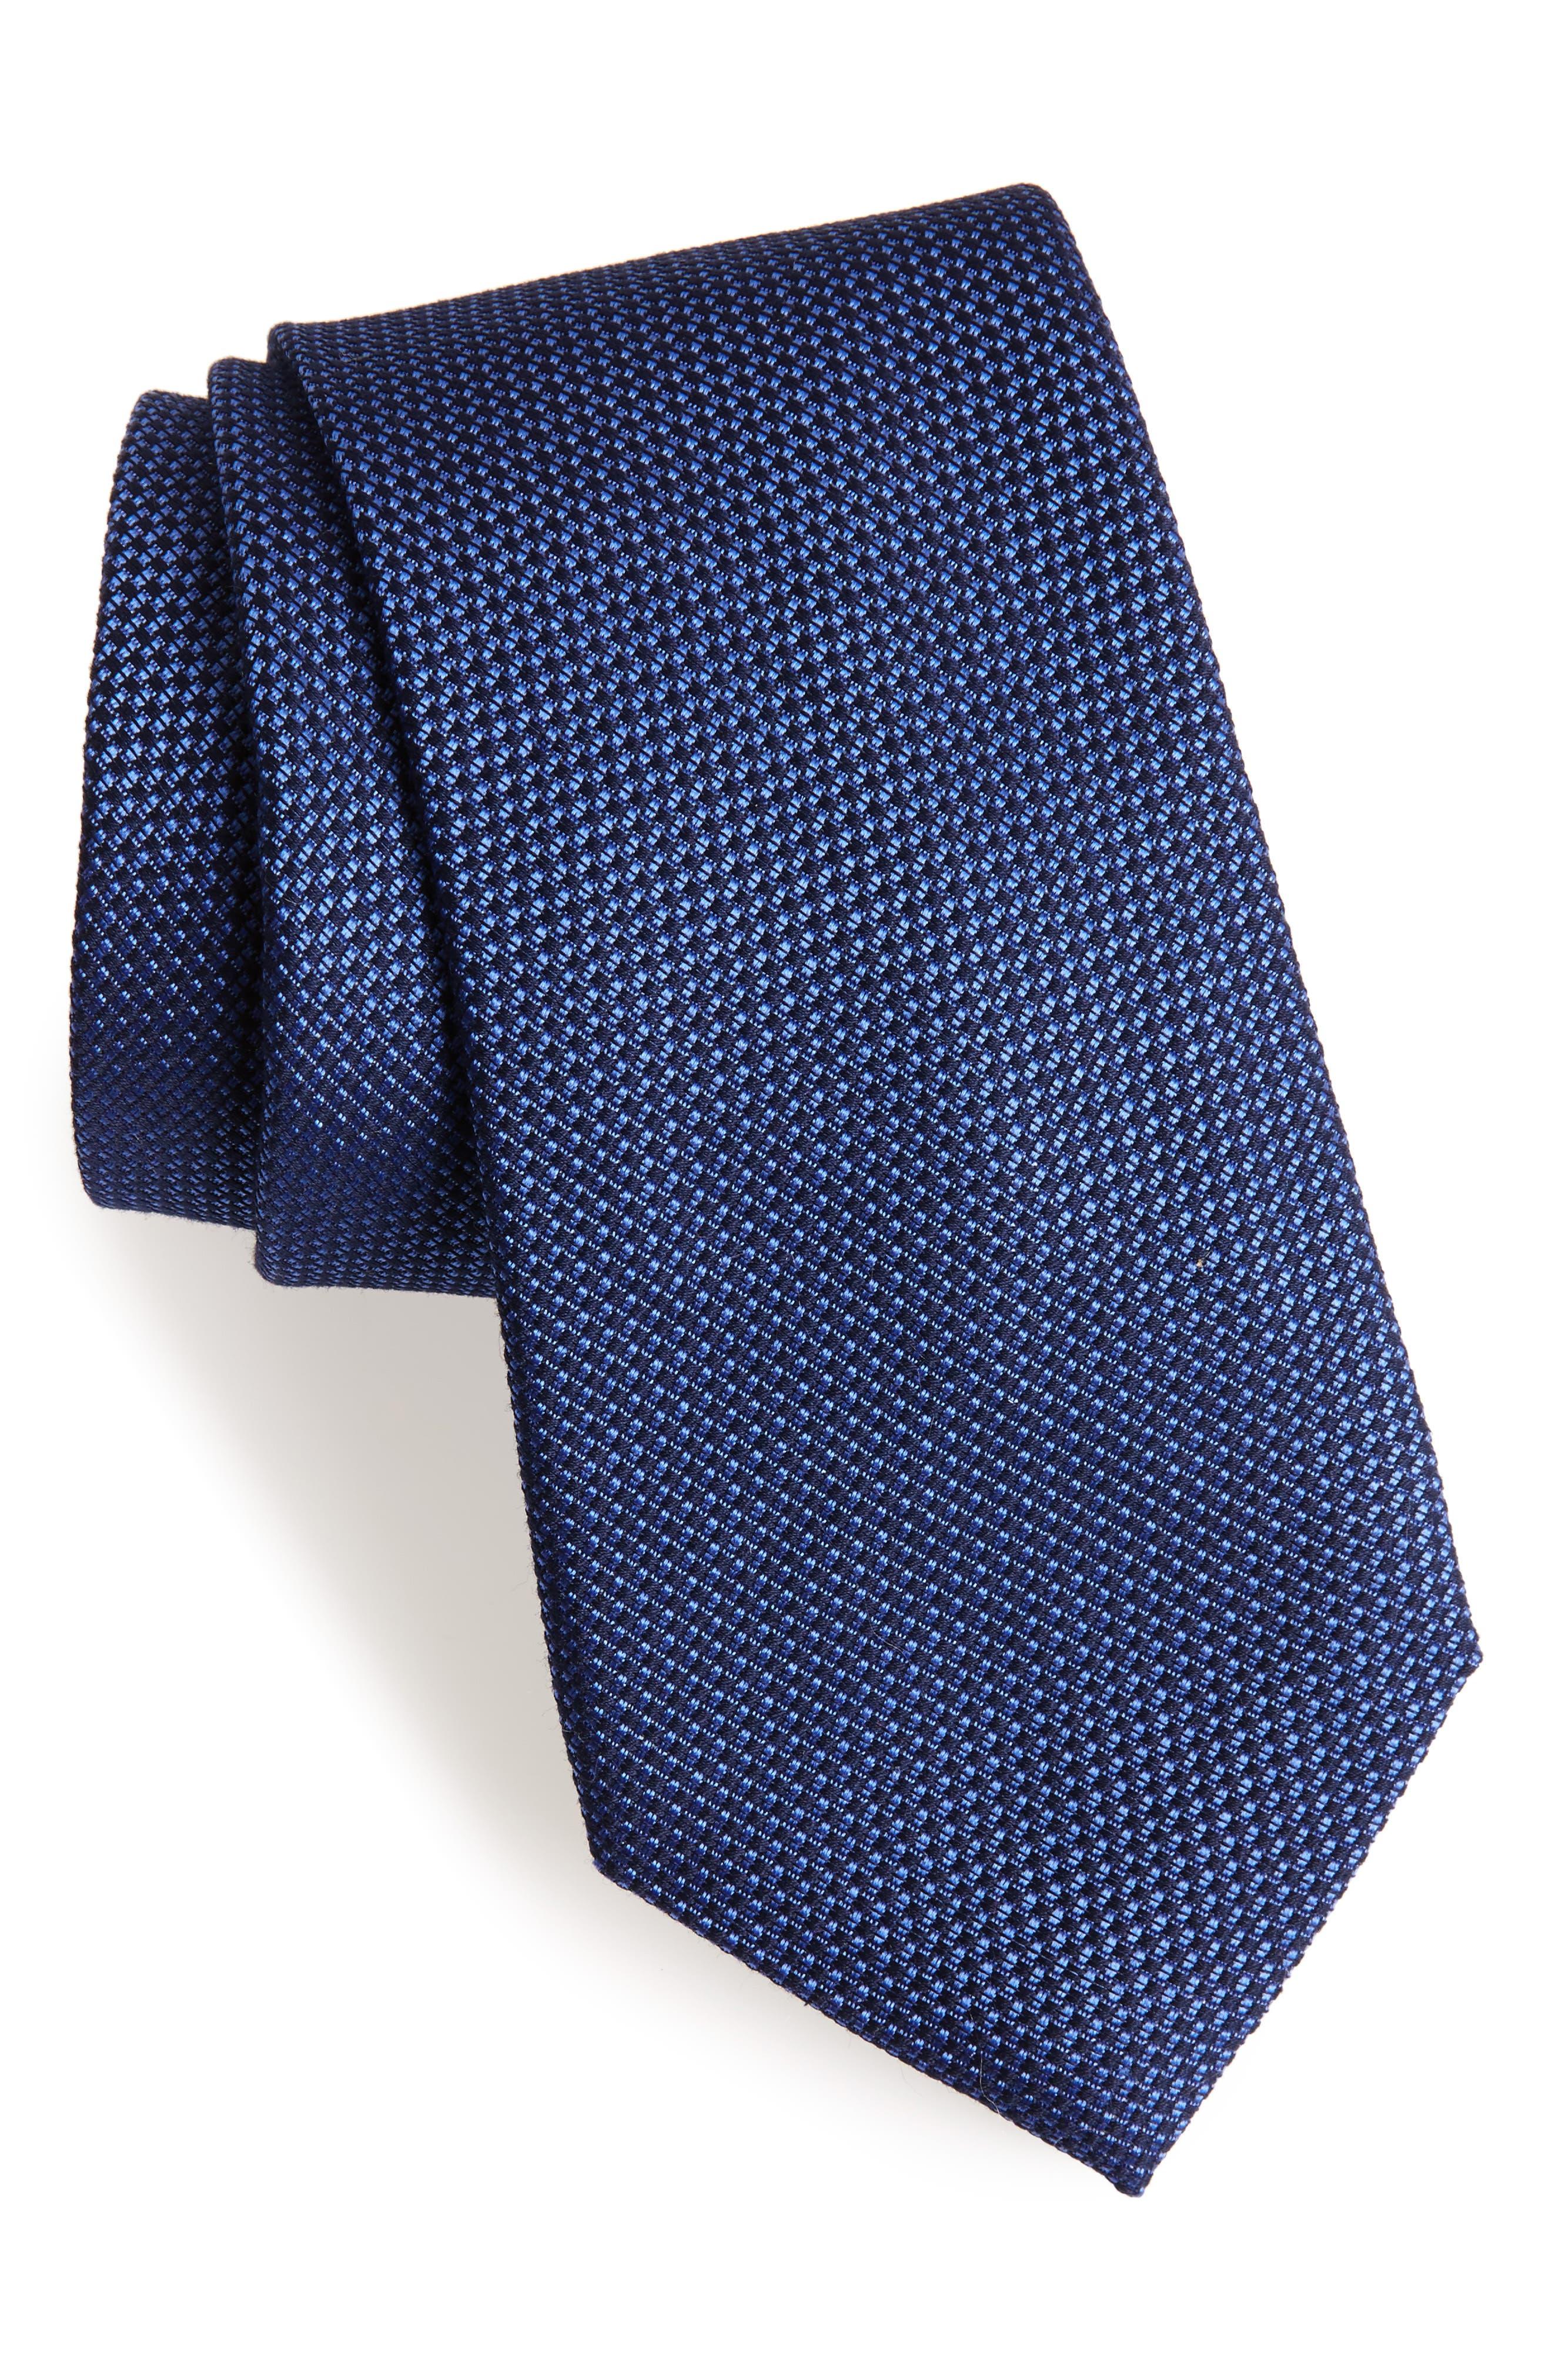 Seedstitch Solid Cotton & Silk Tie,                         Main,                         color, Navy